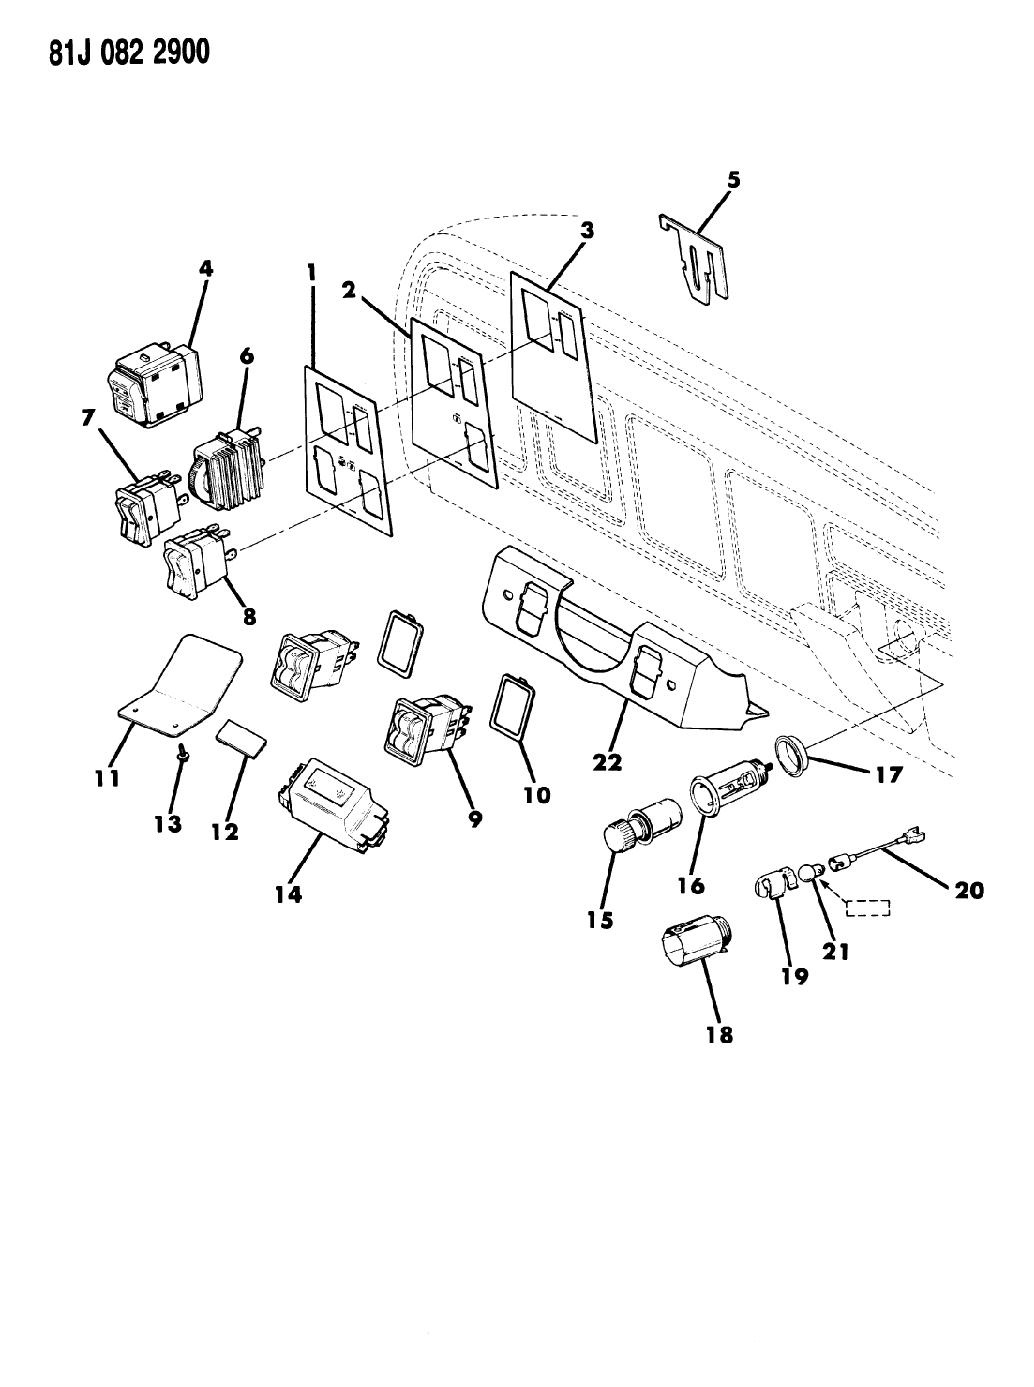 1986 Jeep J10 Wiring Diagrams || Wiring Diagrams Home Jeep J Wiring Diagrams on